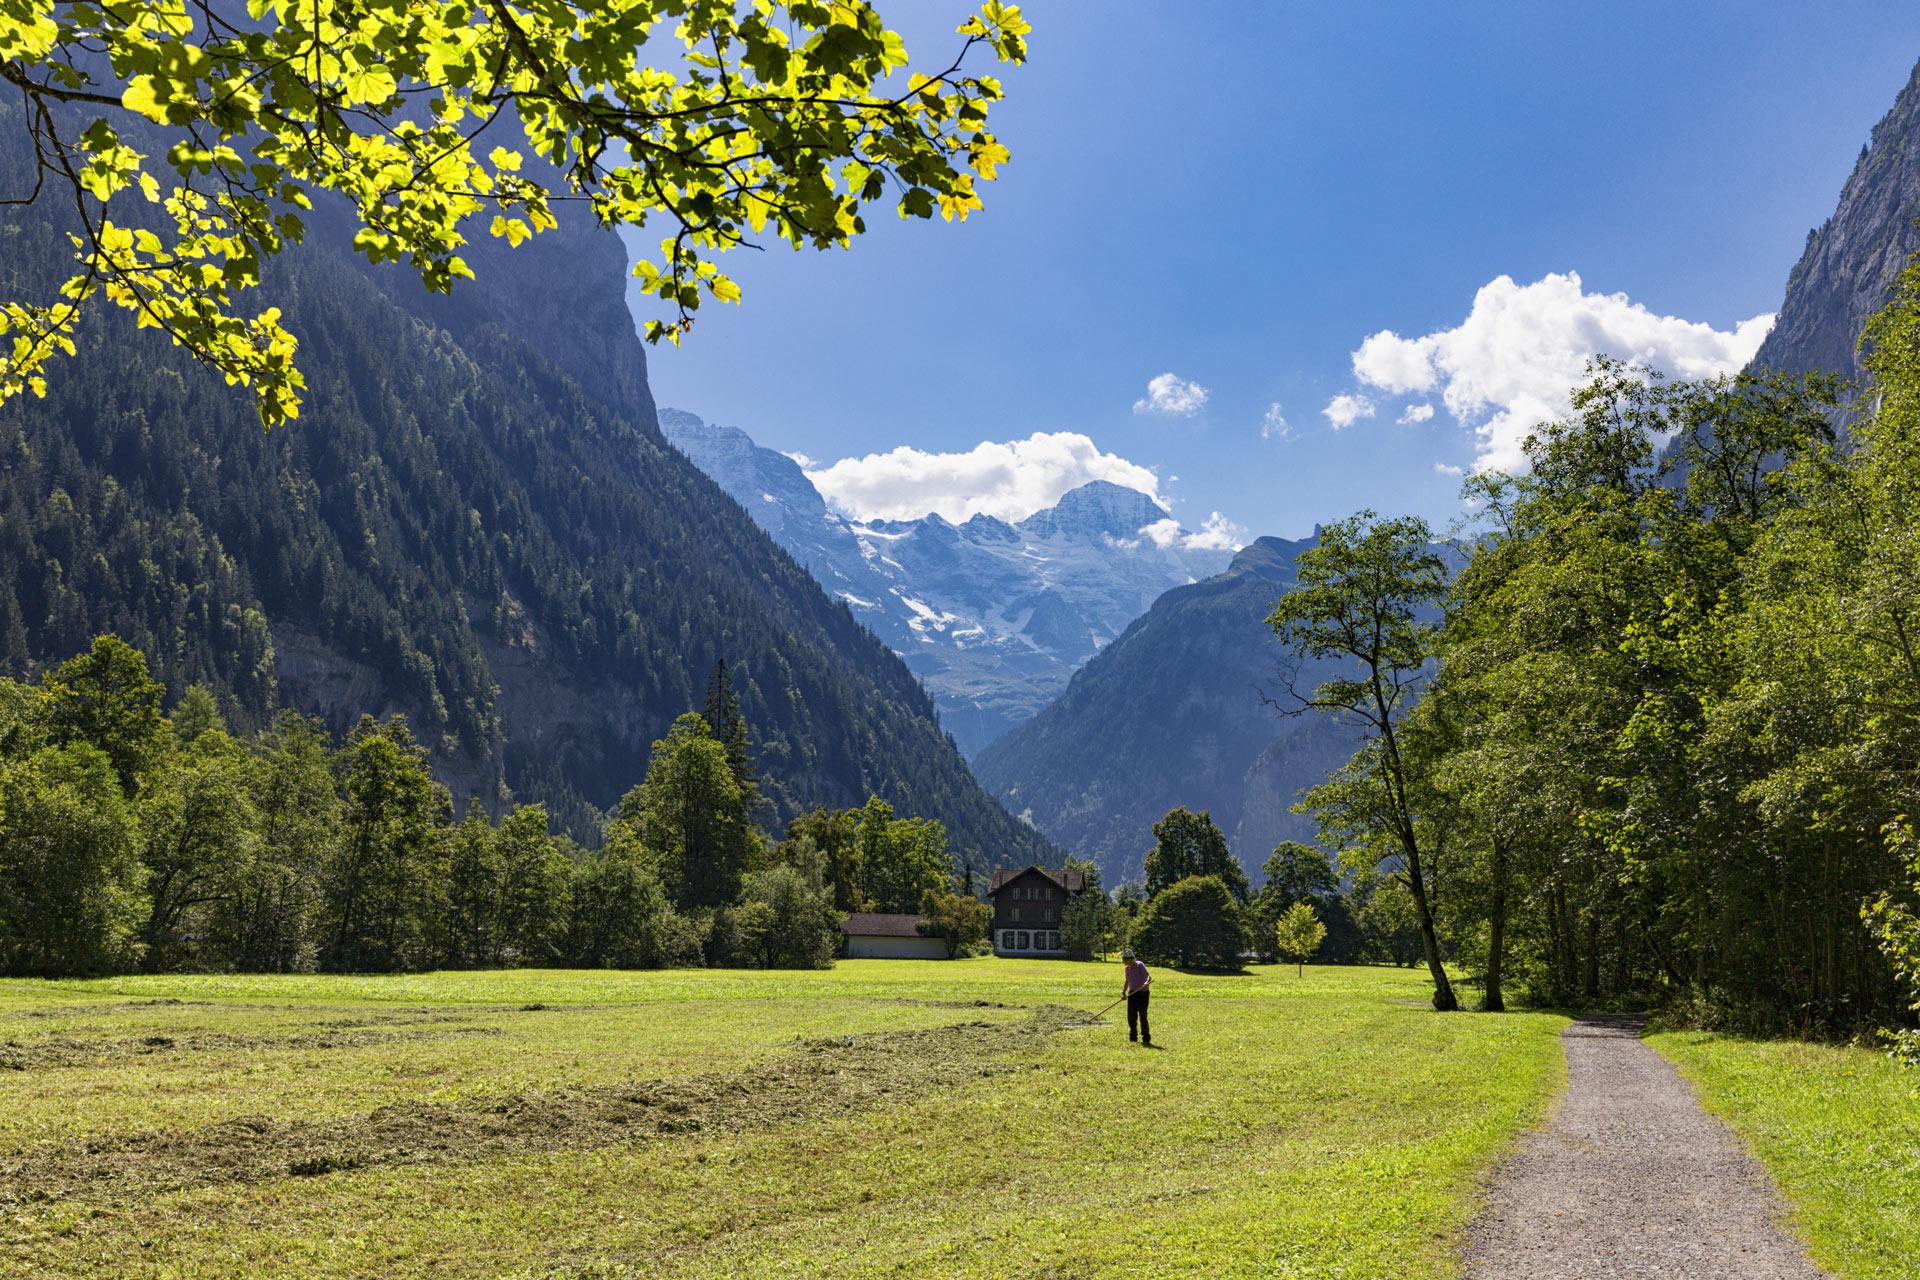 Berner-Oberland_20150909_1851-2